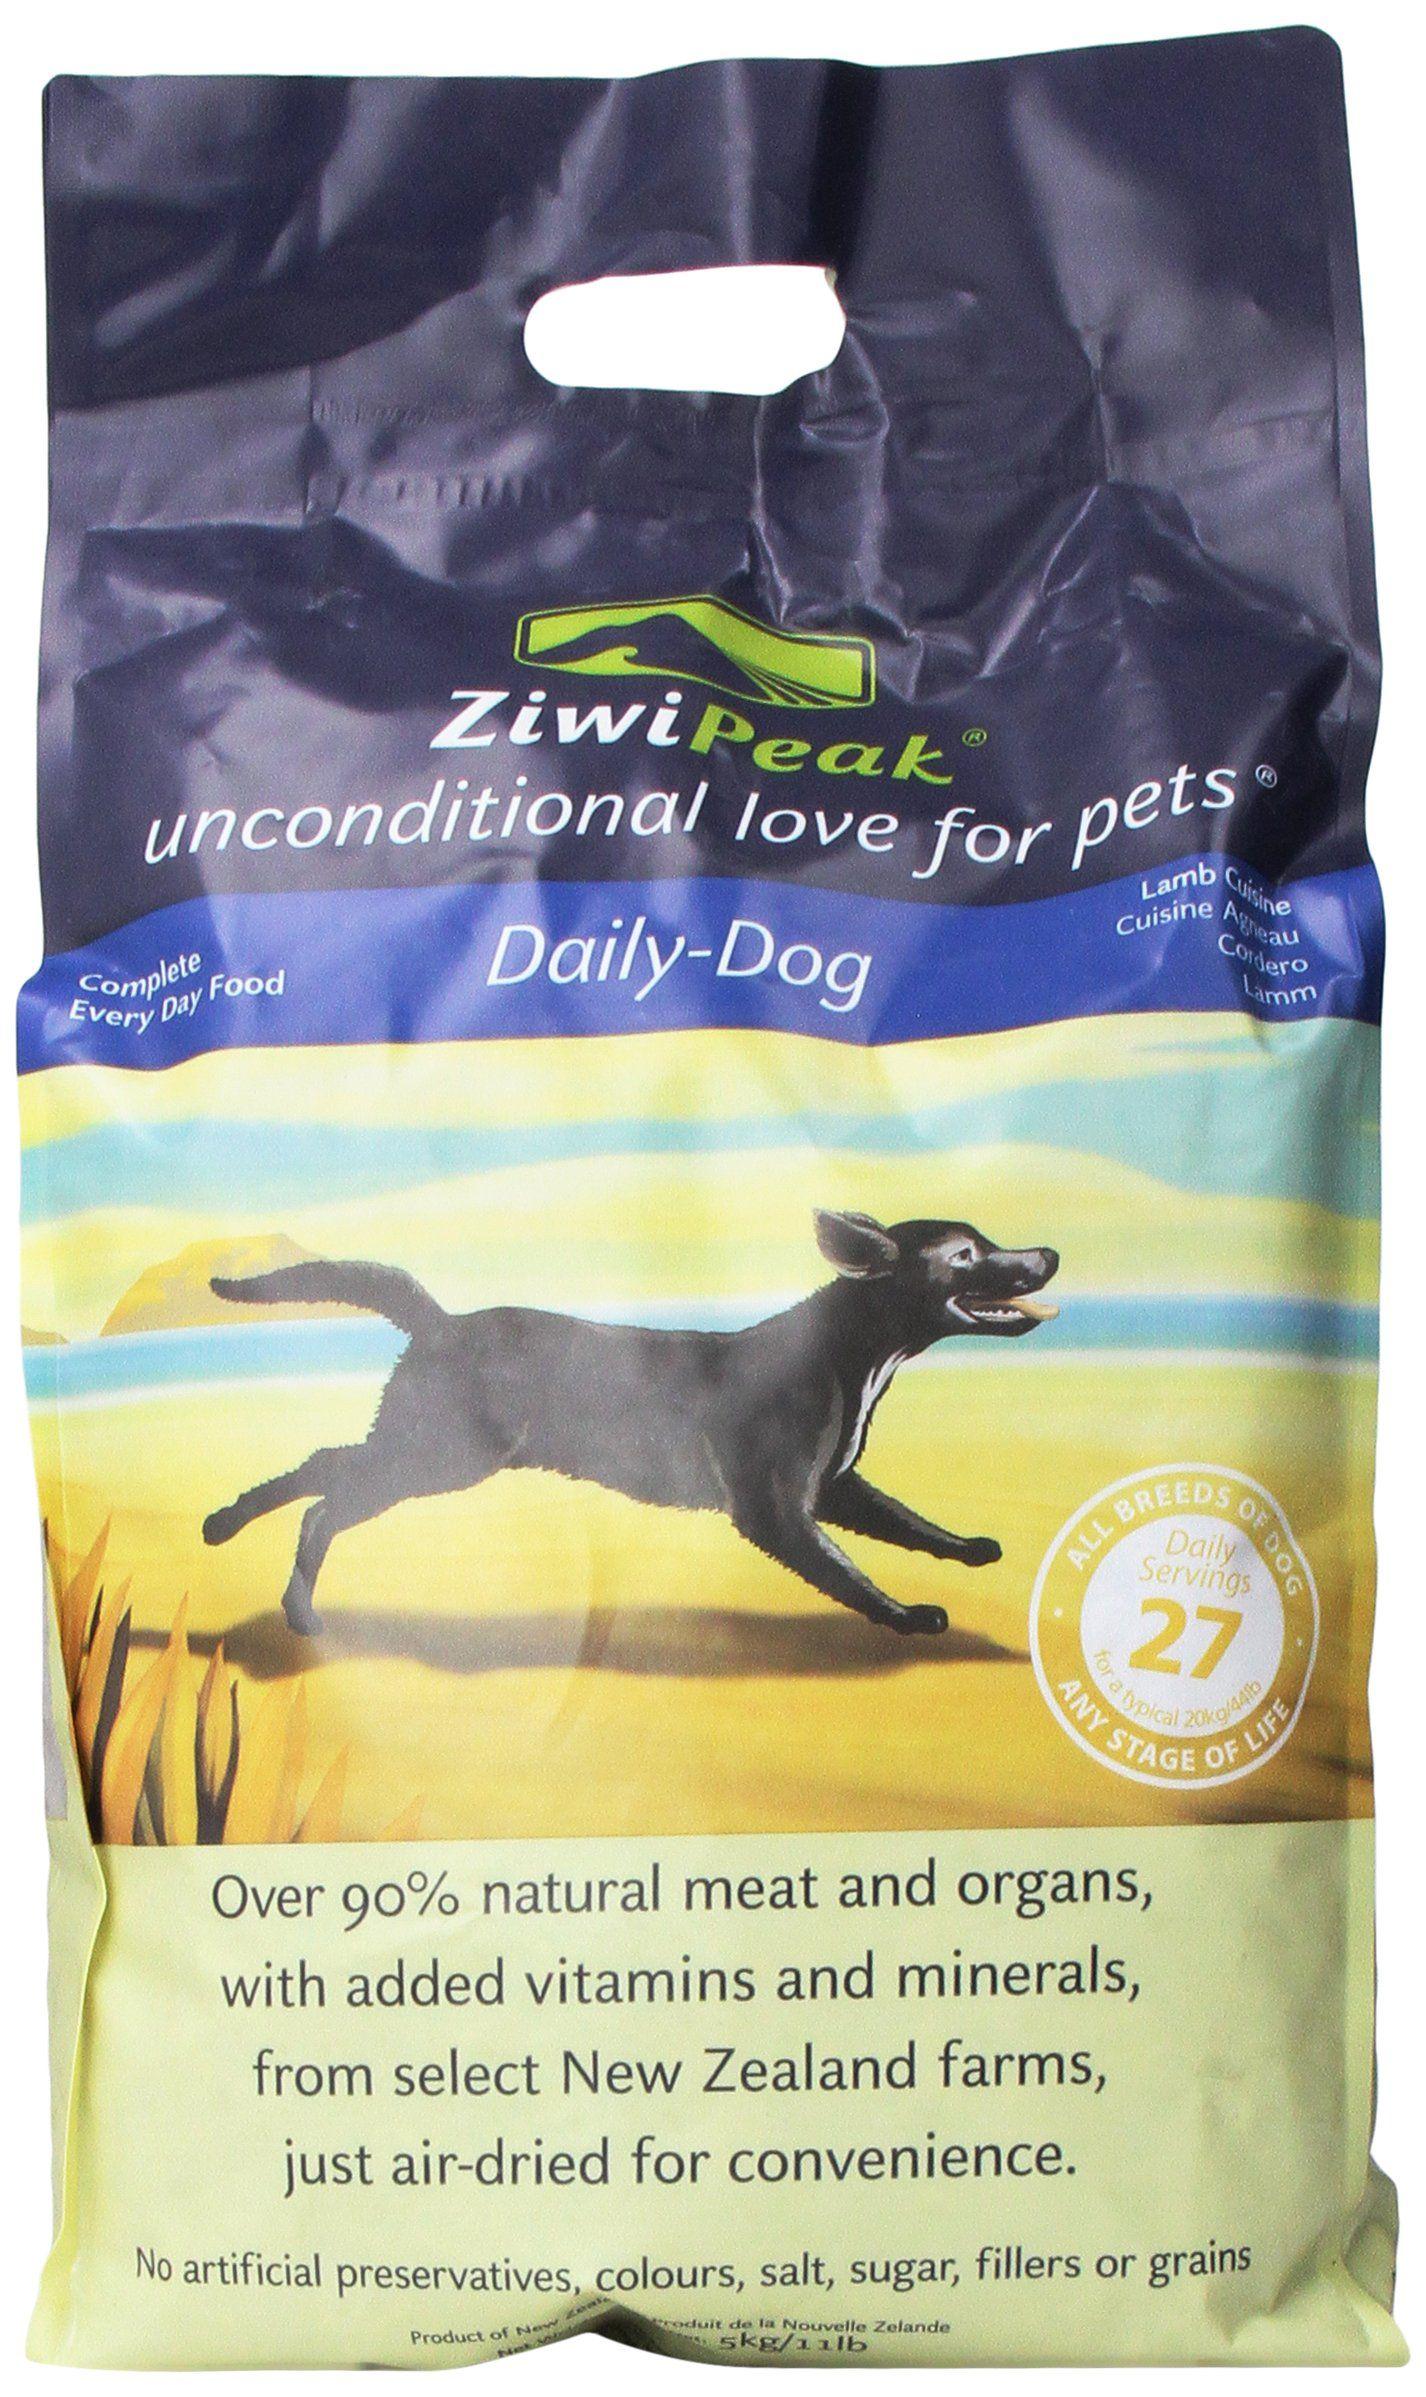 Ziwipeak Daily Cuisine Grain Free Air Dried Dog Food